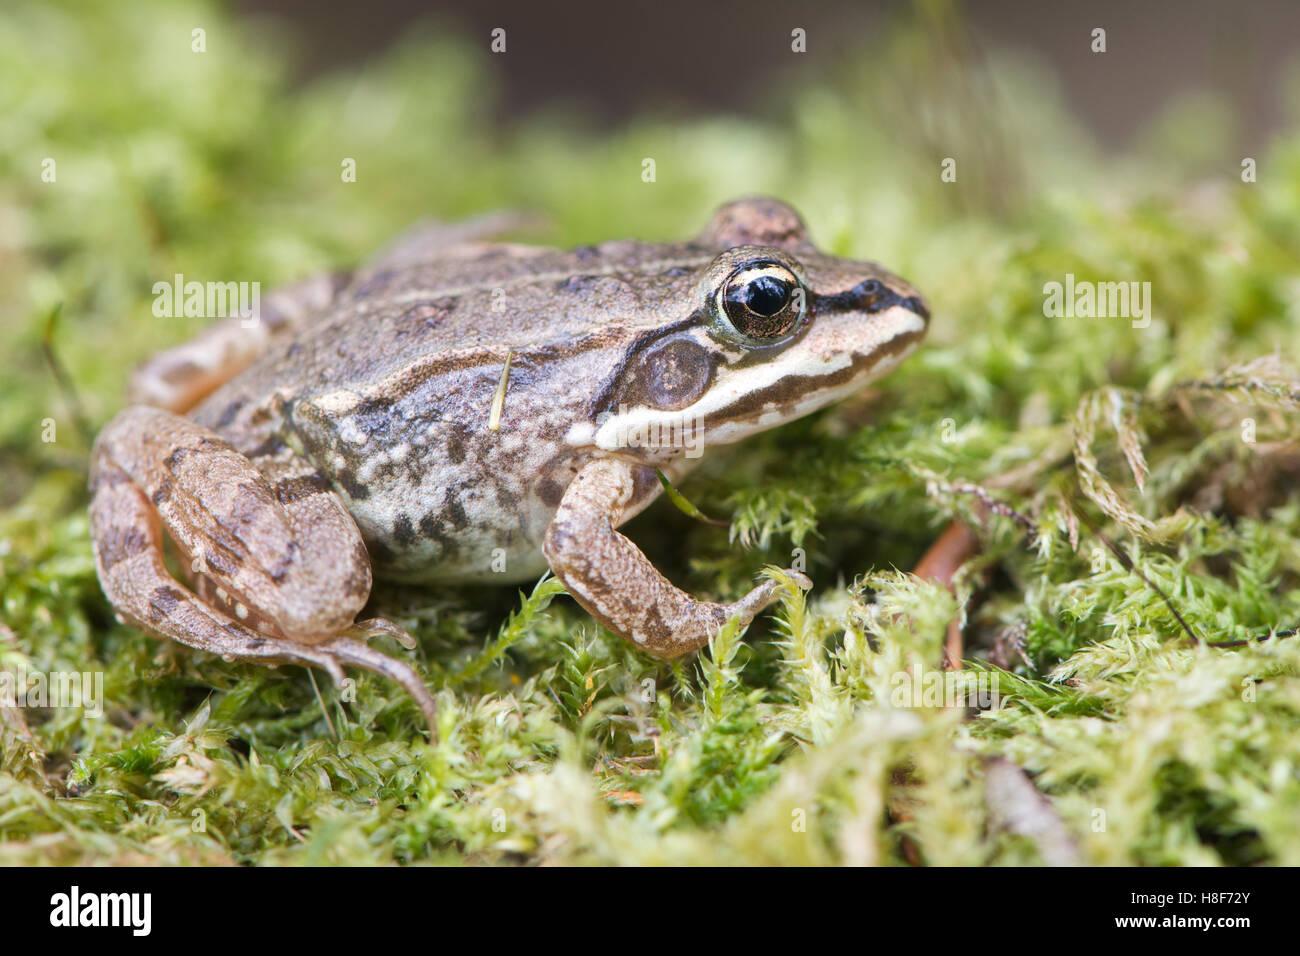 Common Frog (Rana temporaria) in moss, Rhineland-Palatinate, Germany - Stock Image